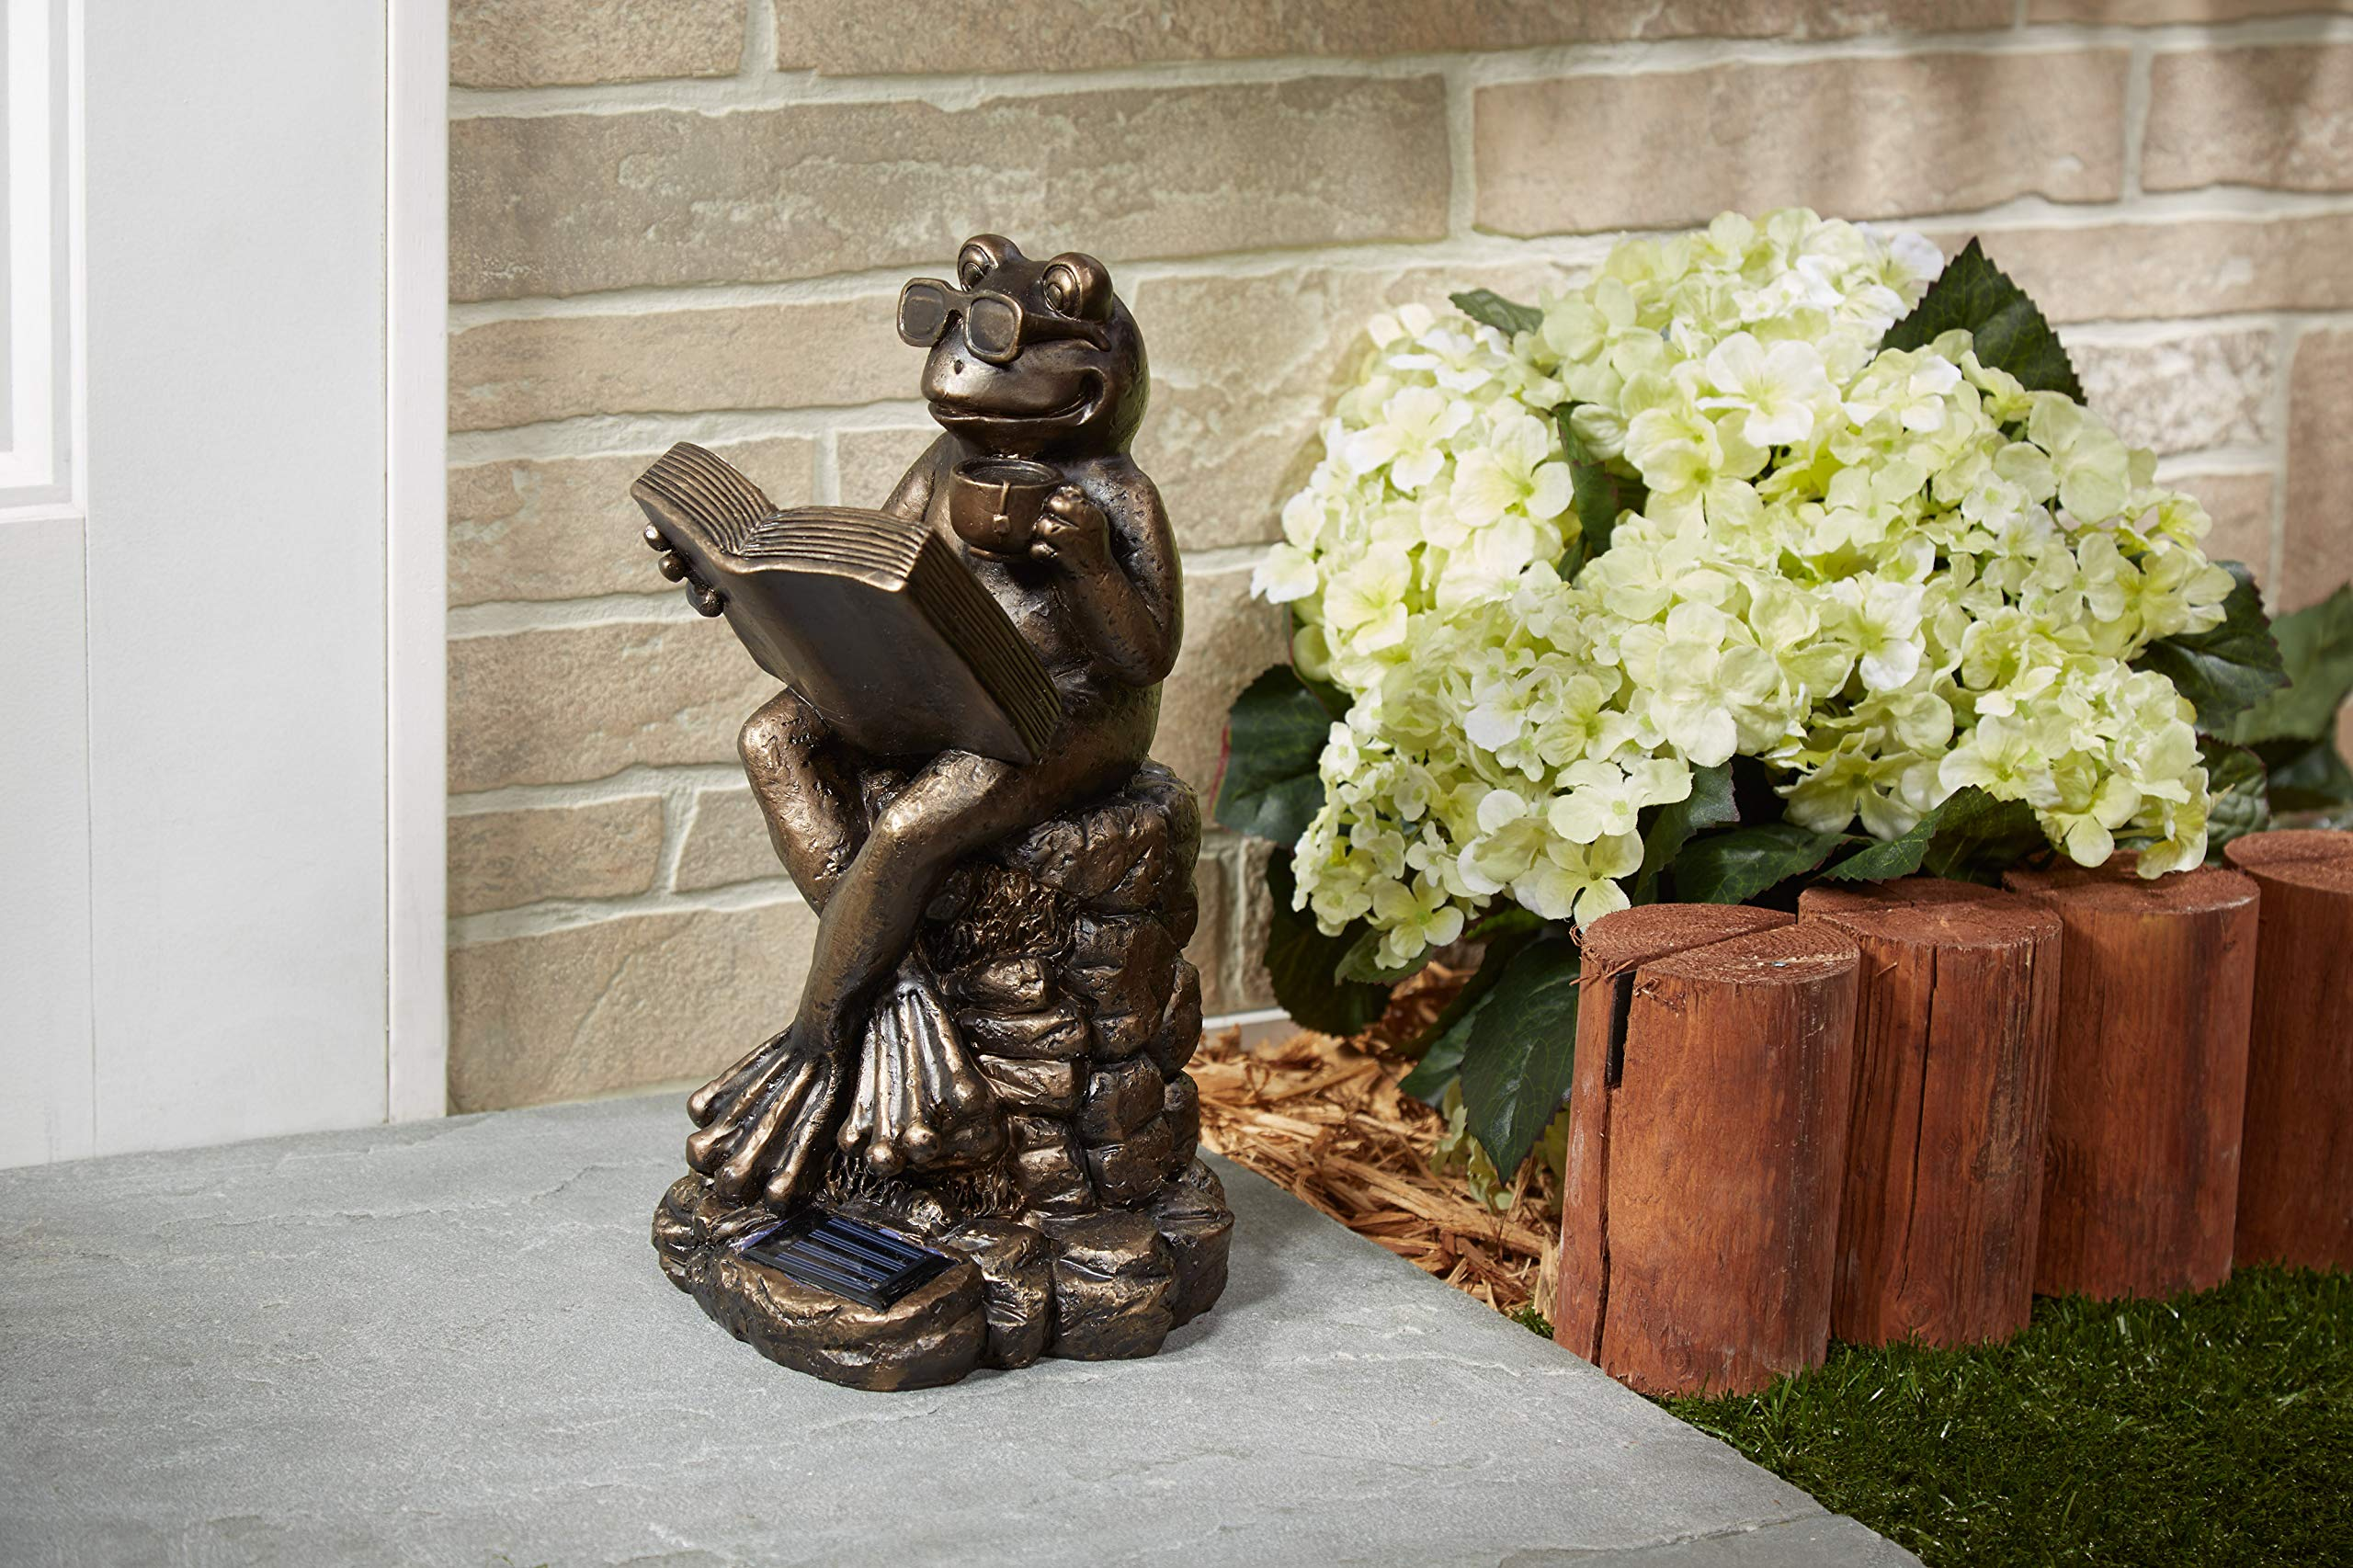 Smart Solar 3647WRM1 Solar Frog Light Statue, Brown